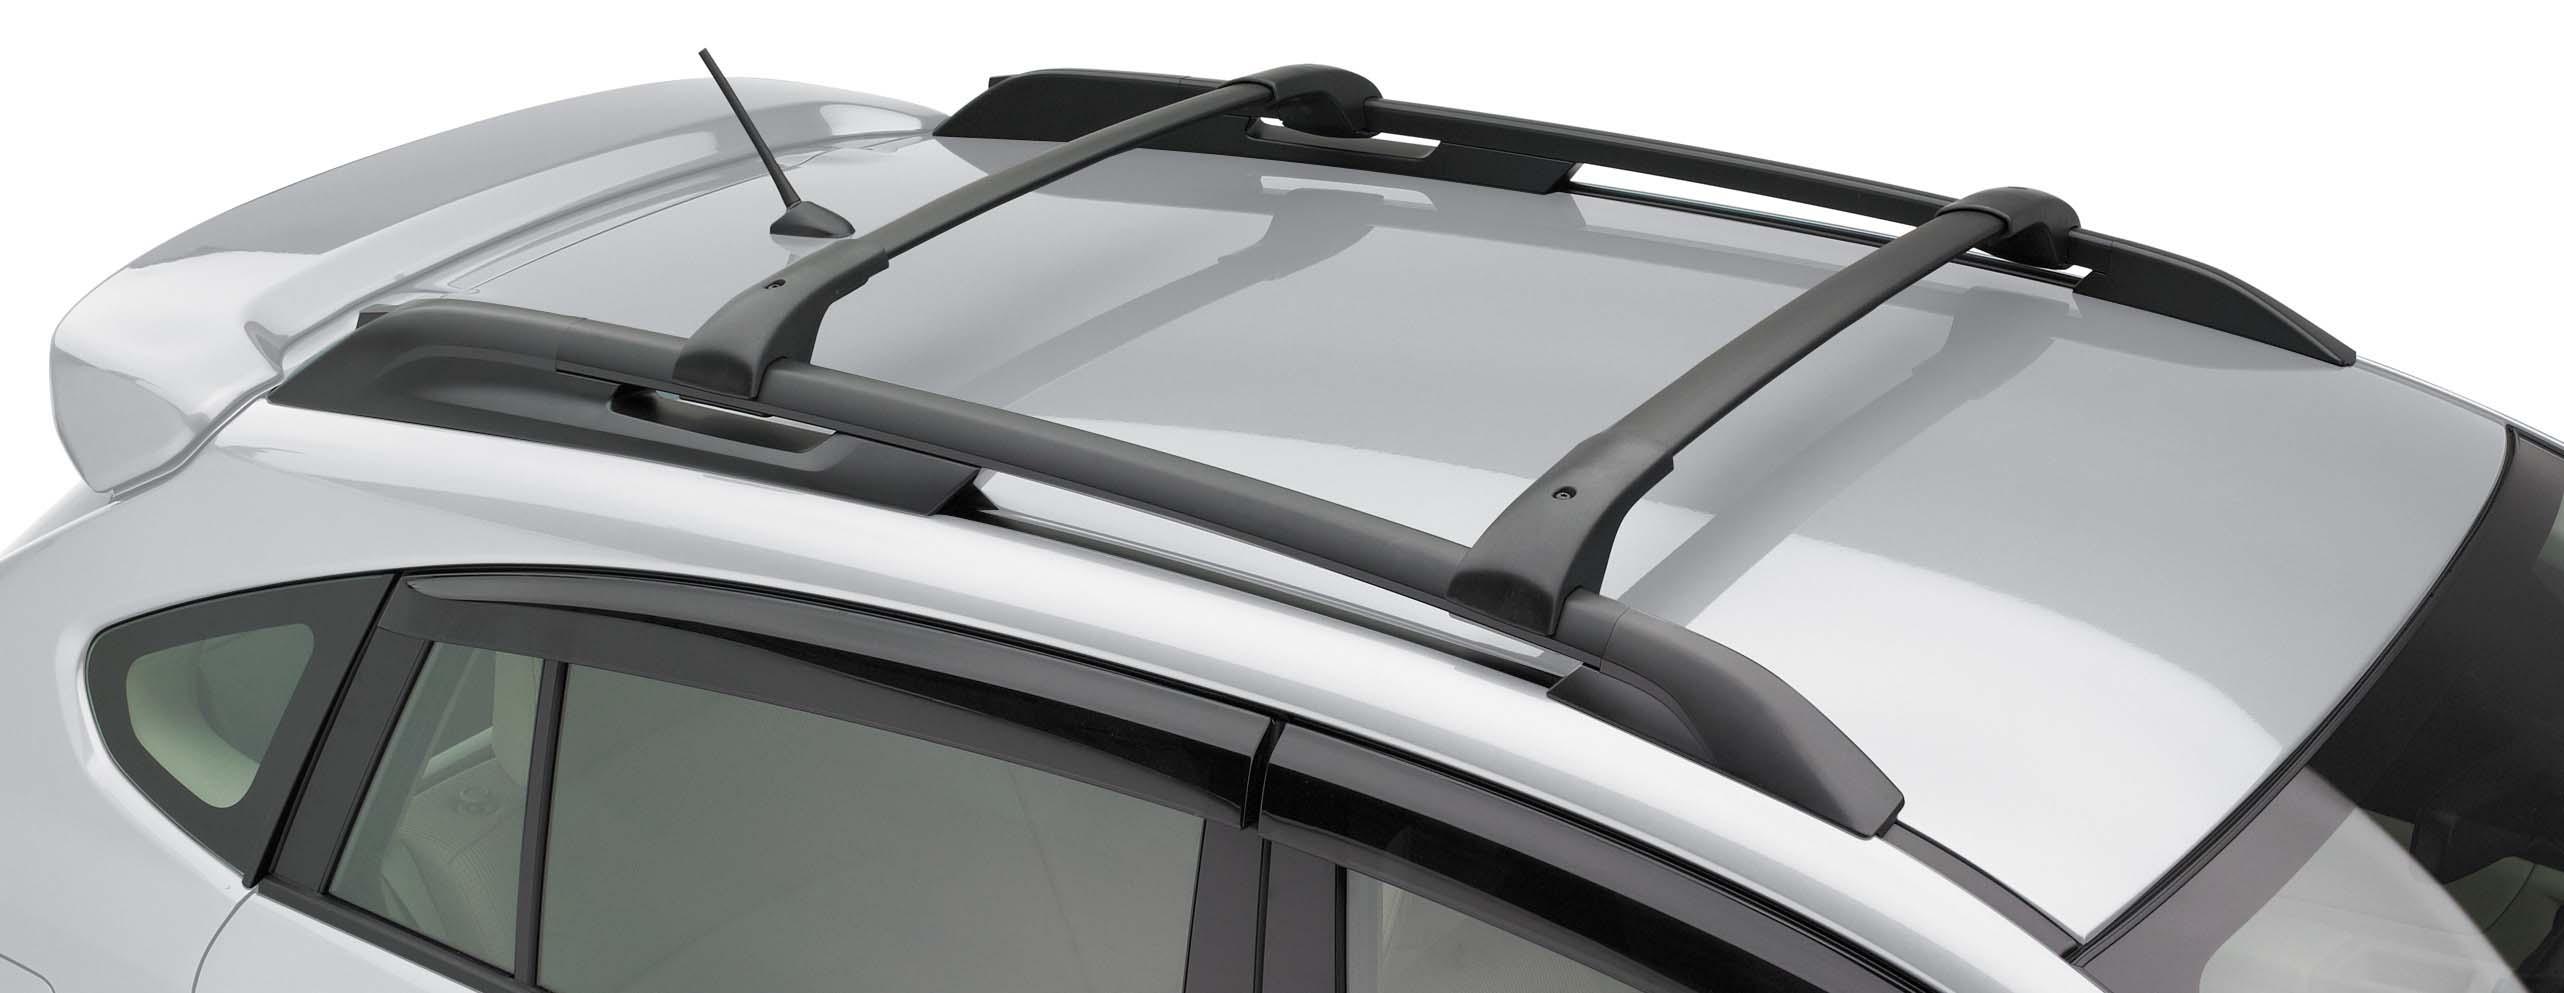 Subaru Crosstrek Roof Cargo >> 2016 Subaru Crosstrek Cross Bar Set - Aero. CROSSBAR SET ADJ - E361SFJ100   Liberty Auto City ...